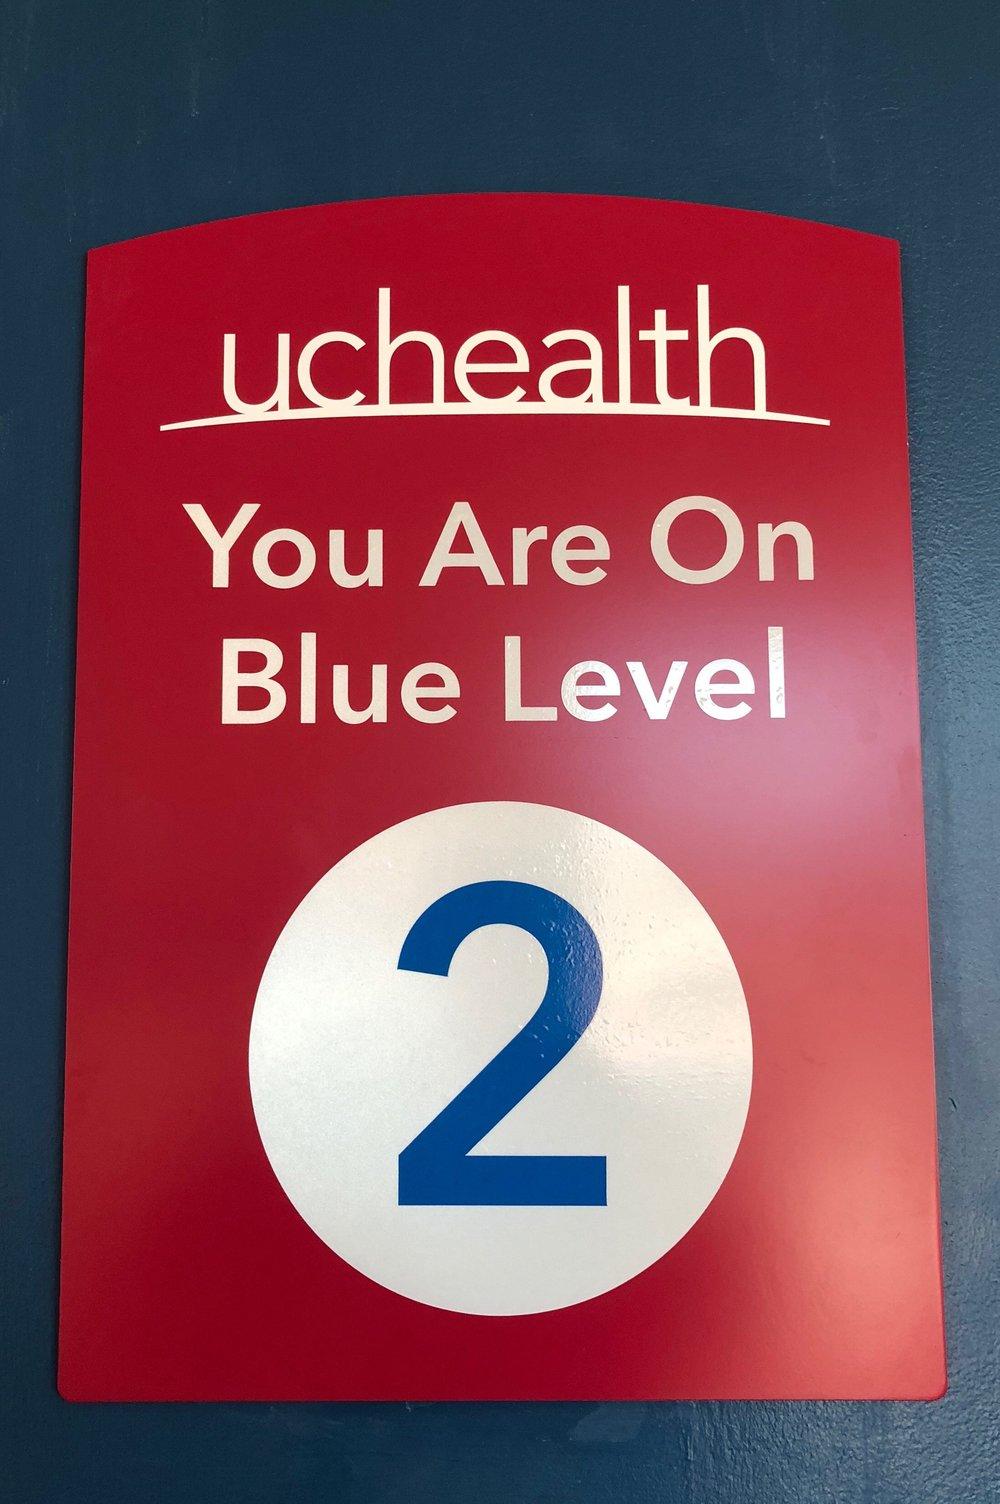 UC Health 5.jpeg